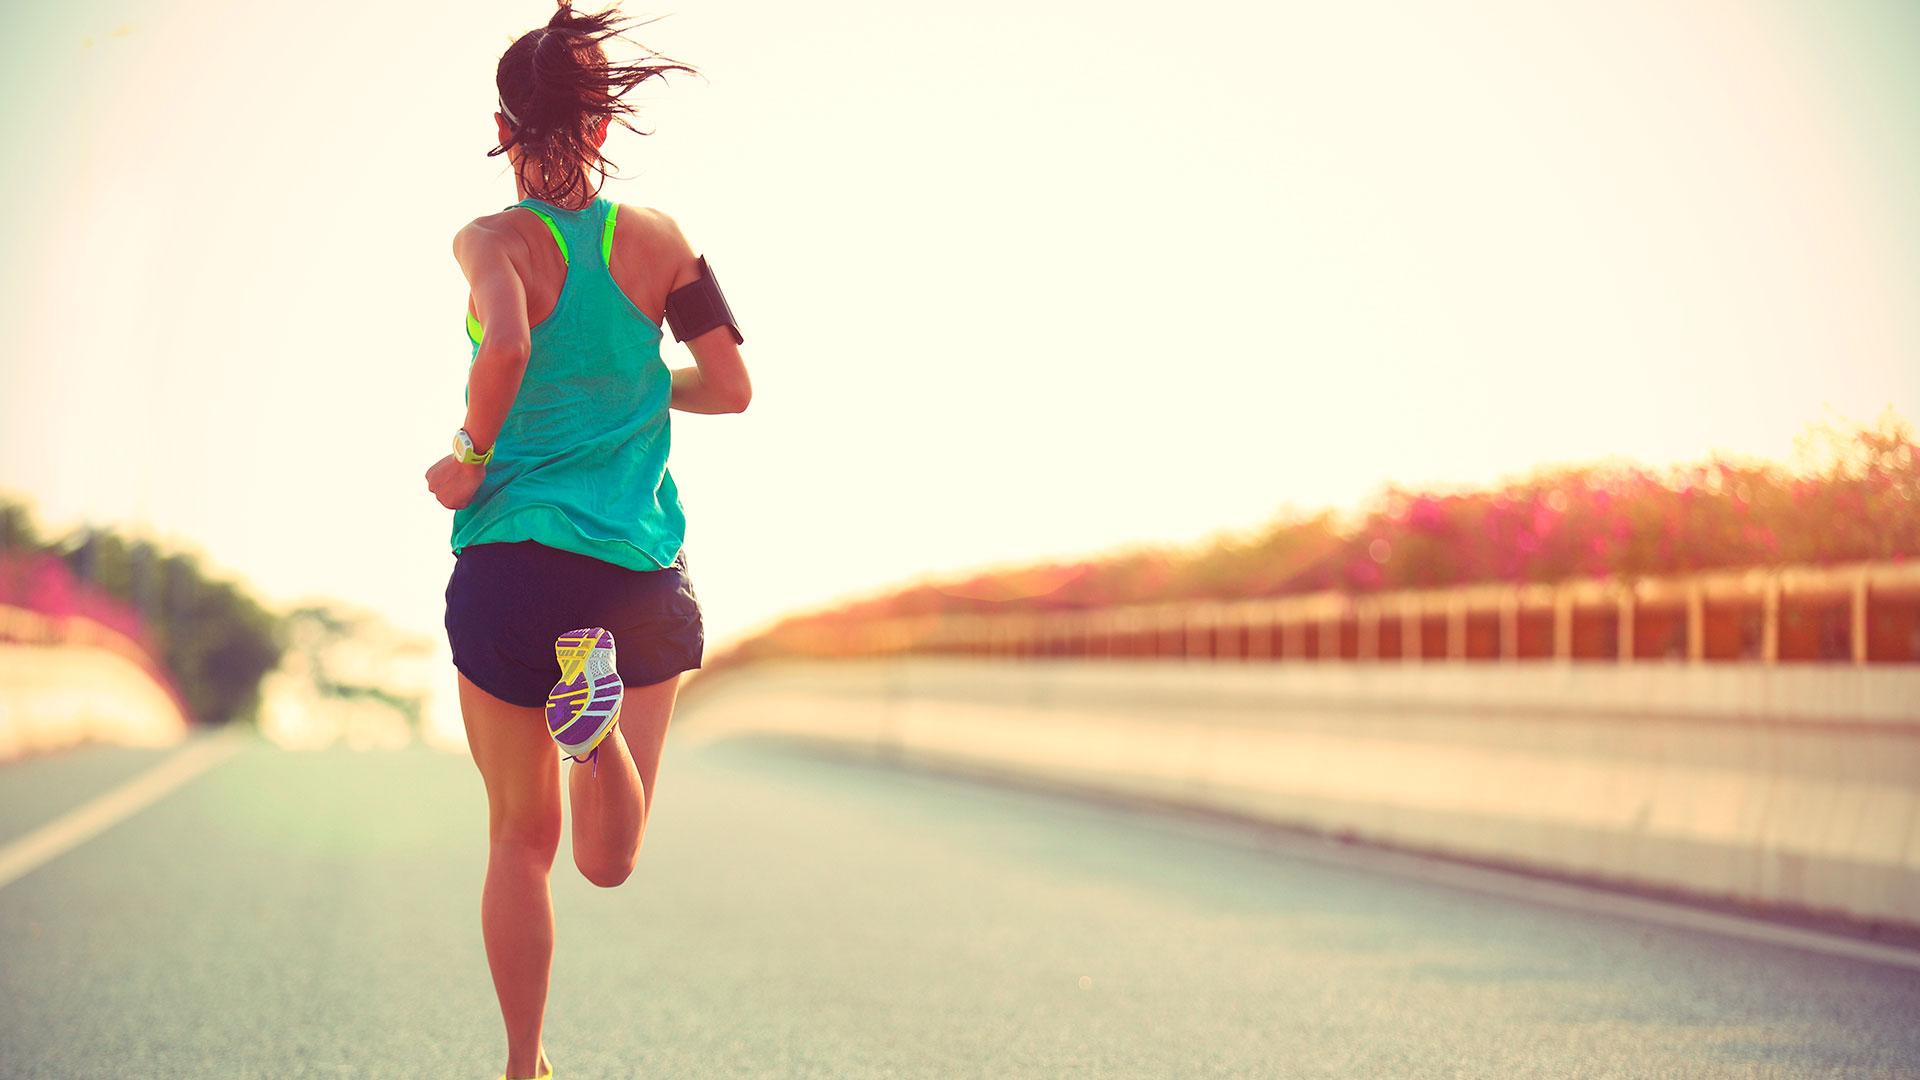 Carboidrato e Gordura os combustíveis do exercício